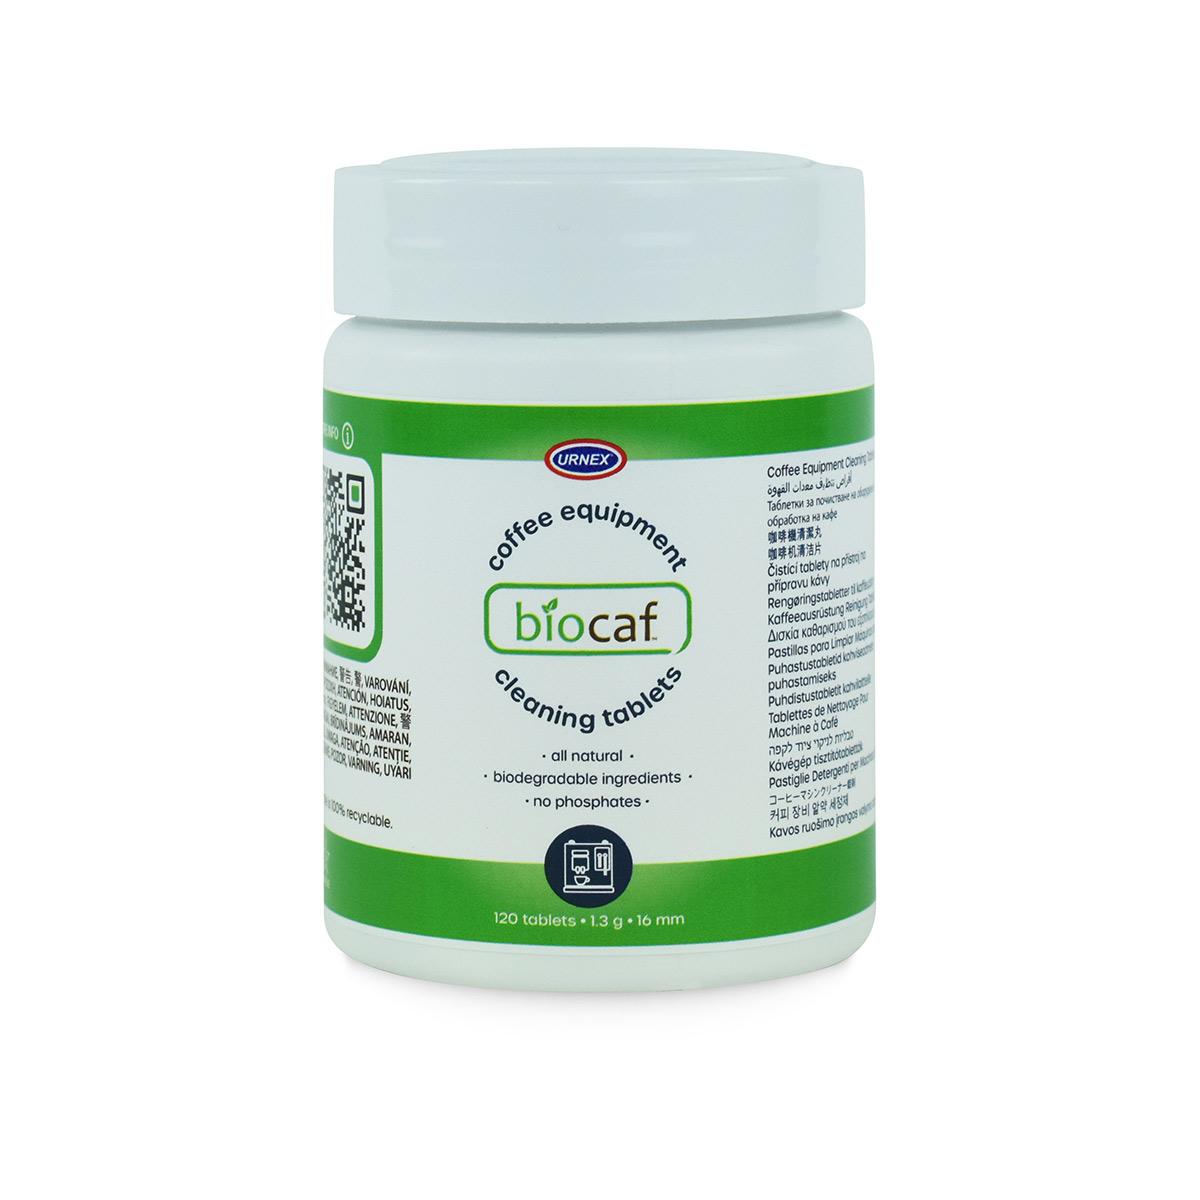 Urnex BioCaf Coffee Cleaning Tablets - Jar of 120